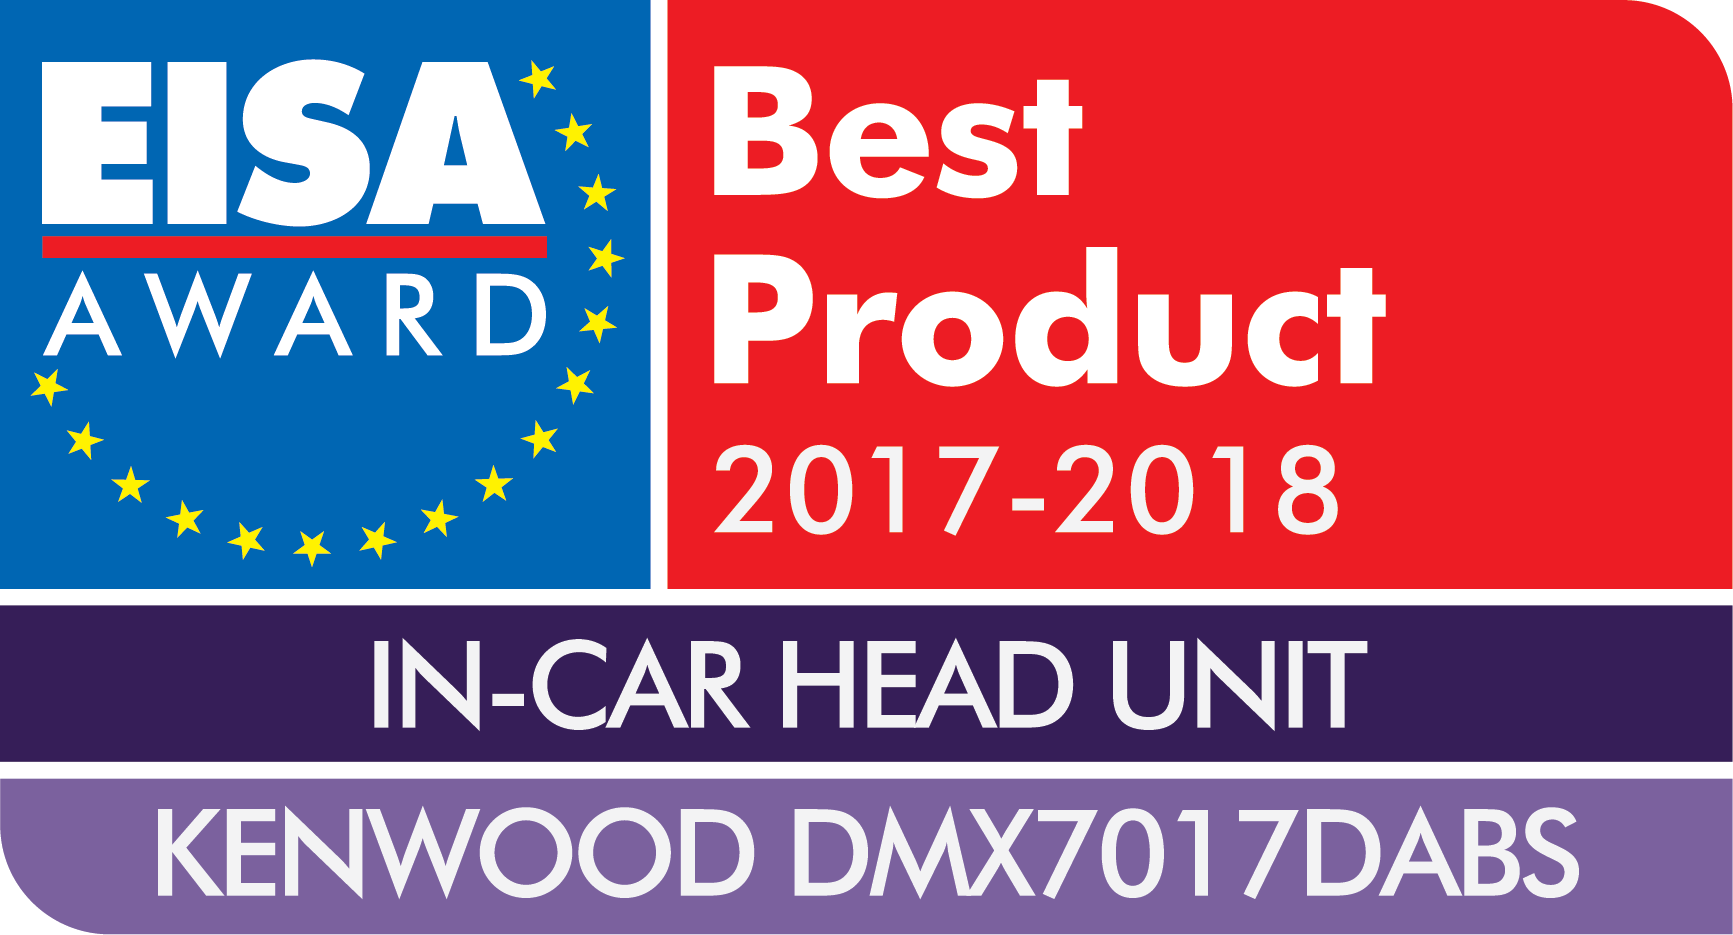 EISA-Award DMX7017DABS